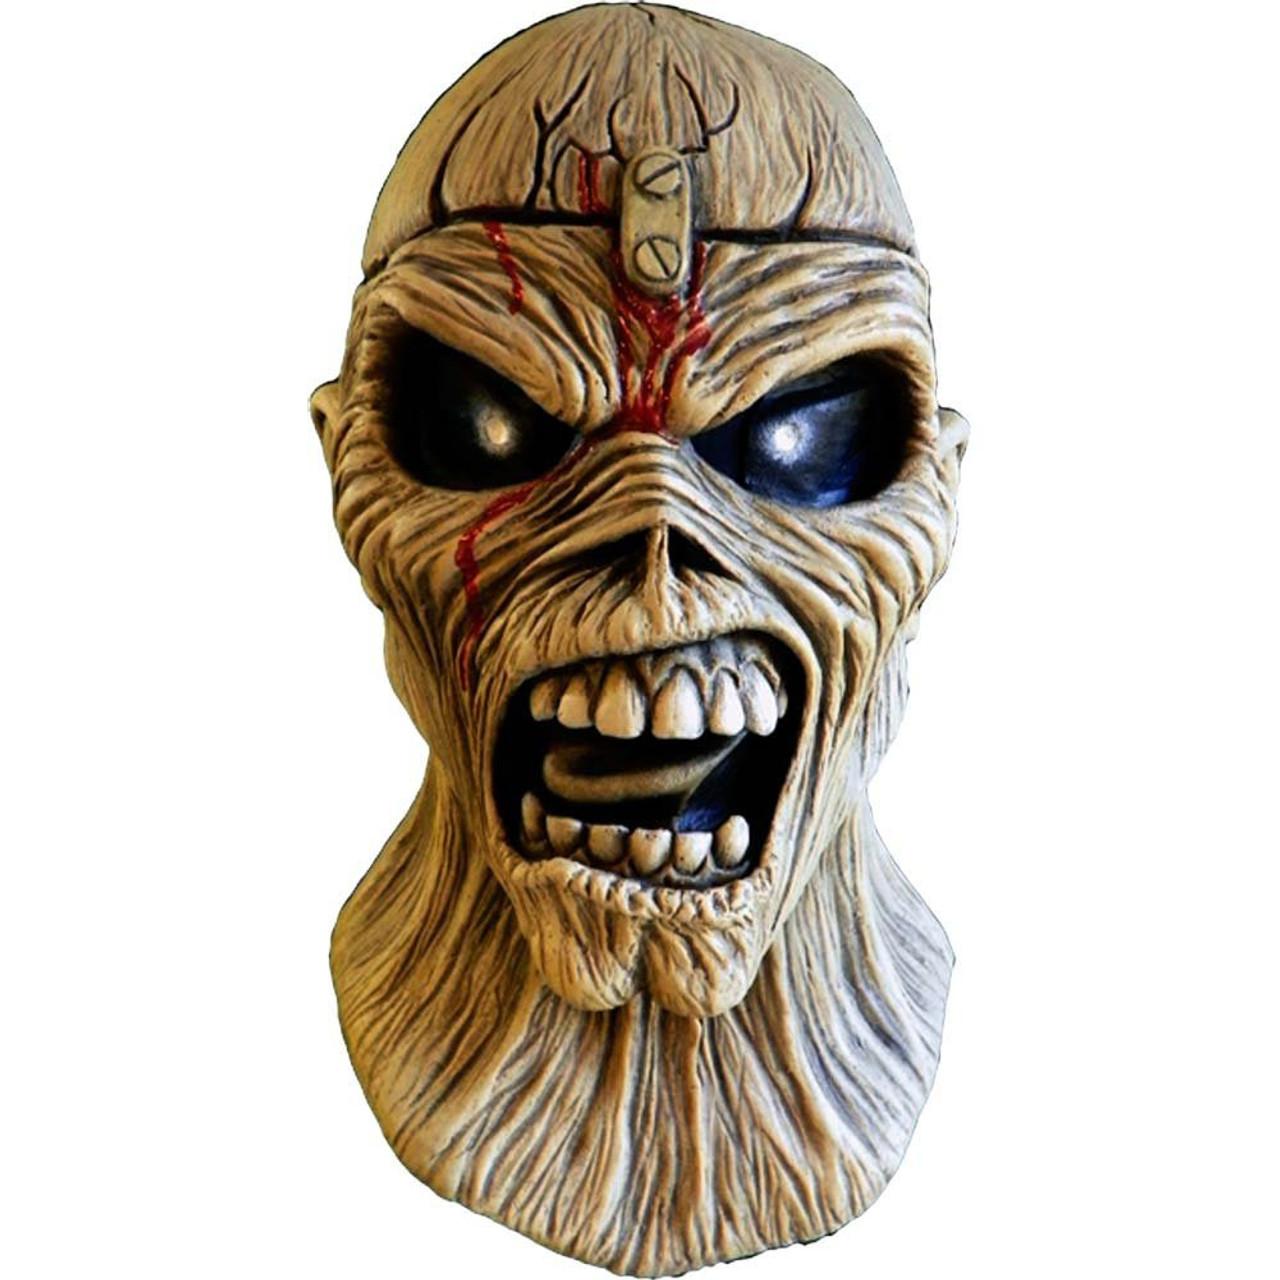 Iron Maiden Aces High Piece Of Mind Eddie Costume Prop Mask Trick Or Treat  Studios   ToyWiz